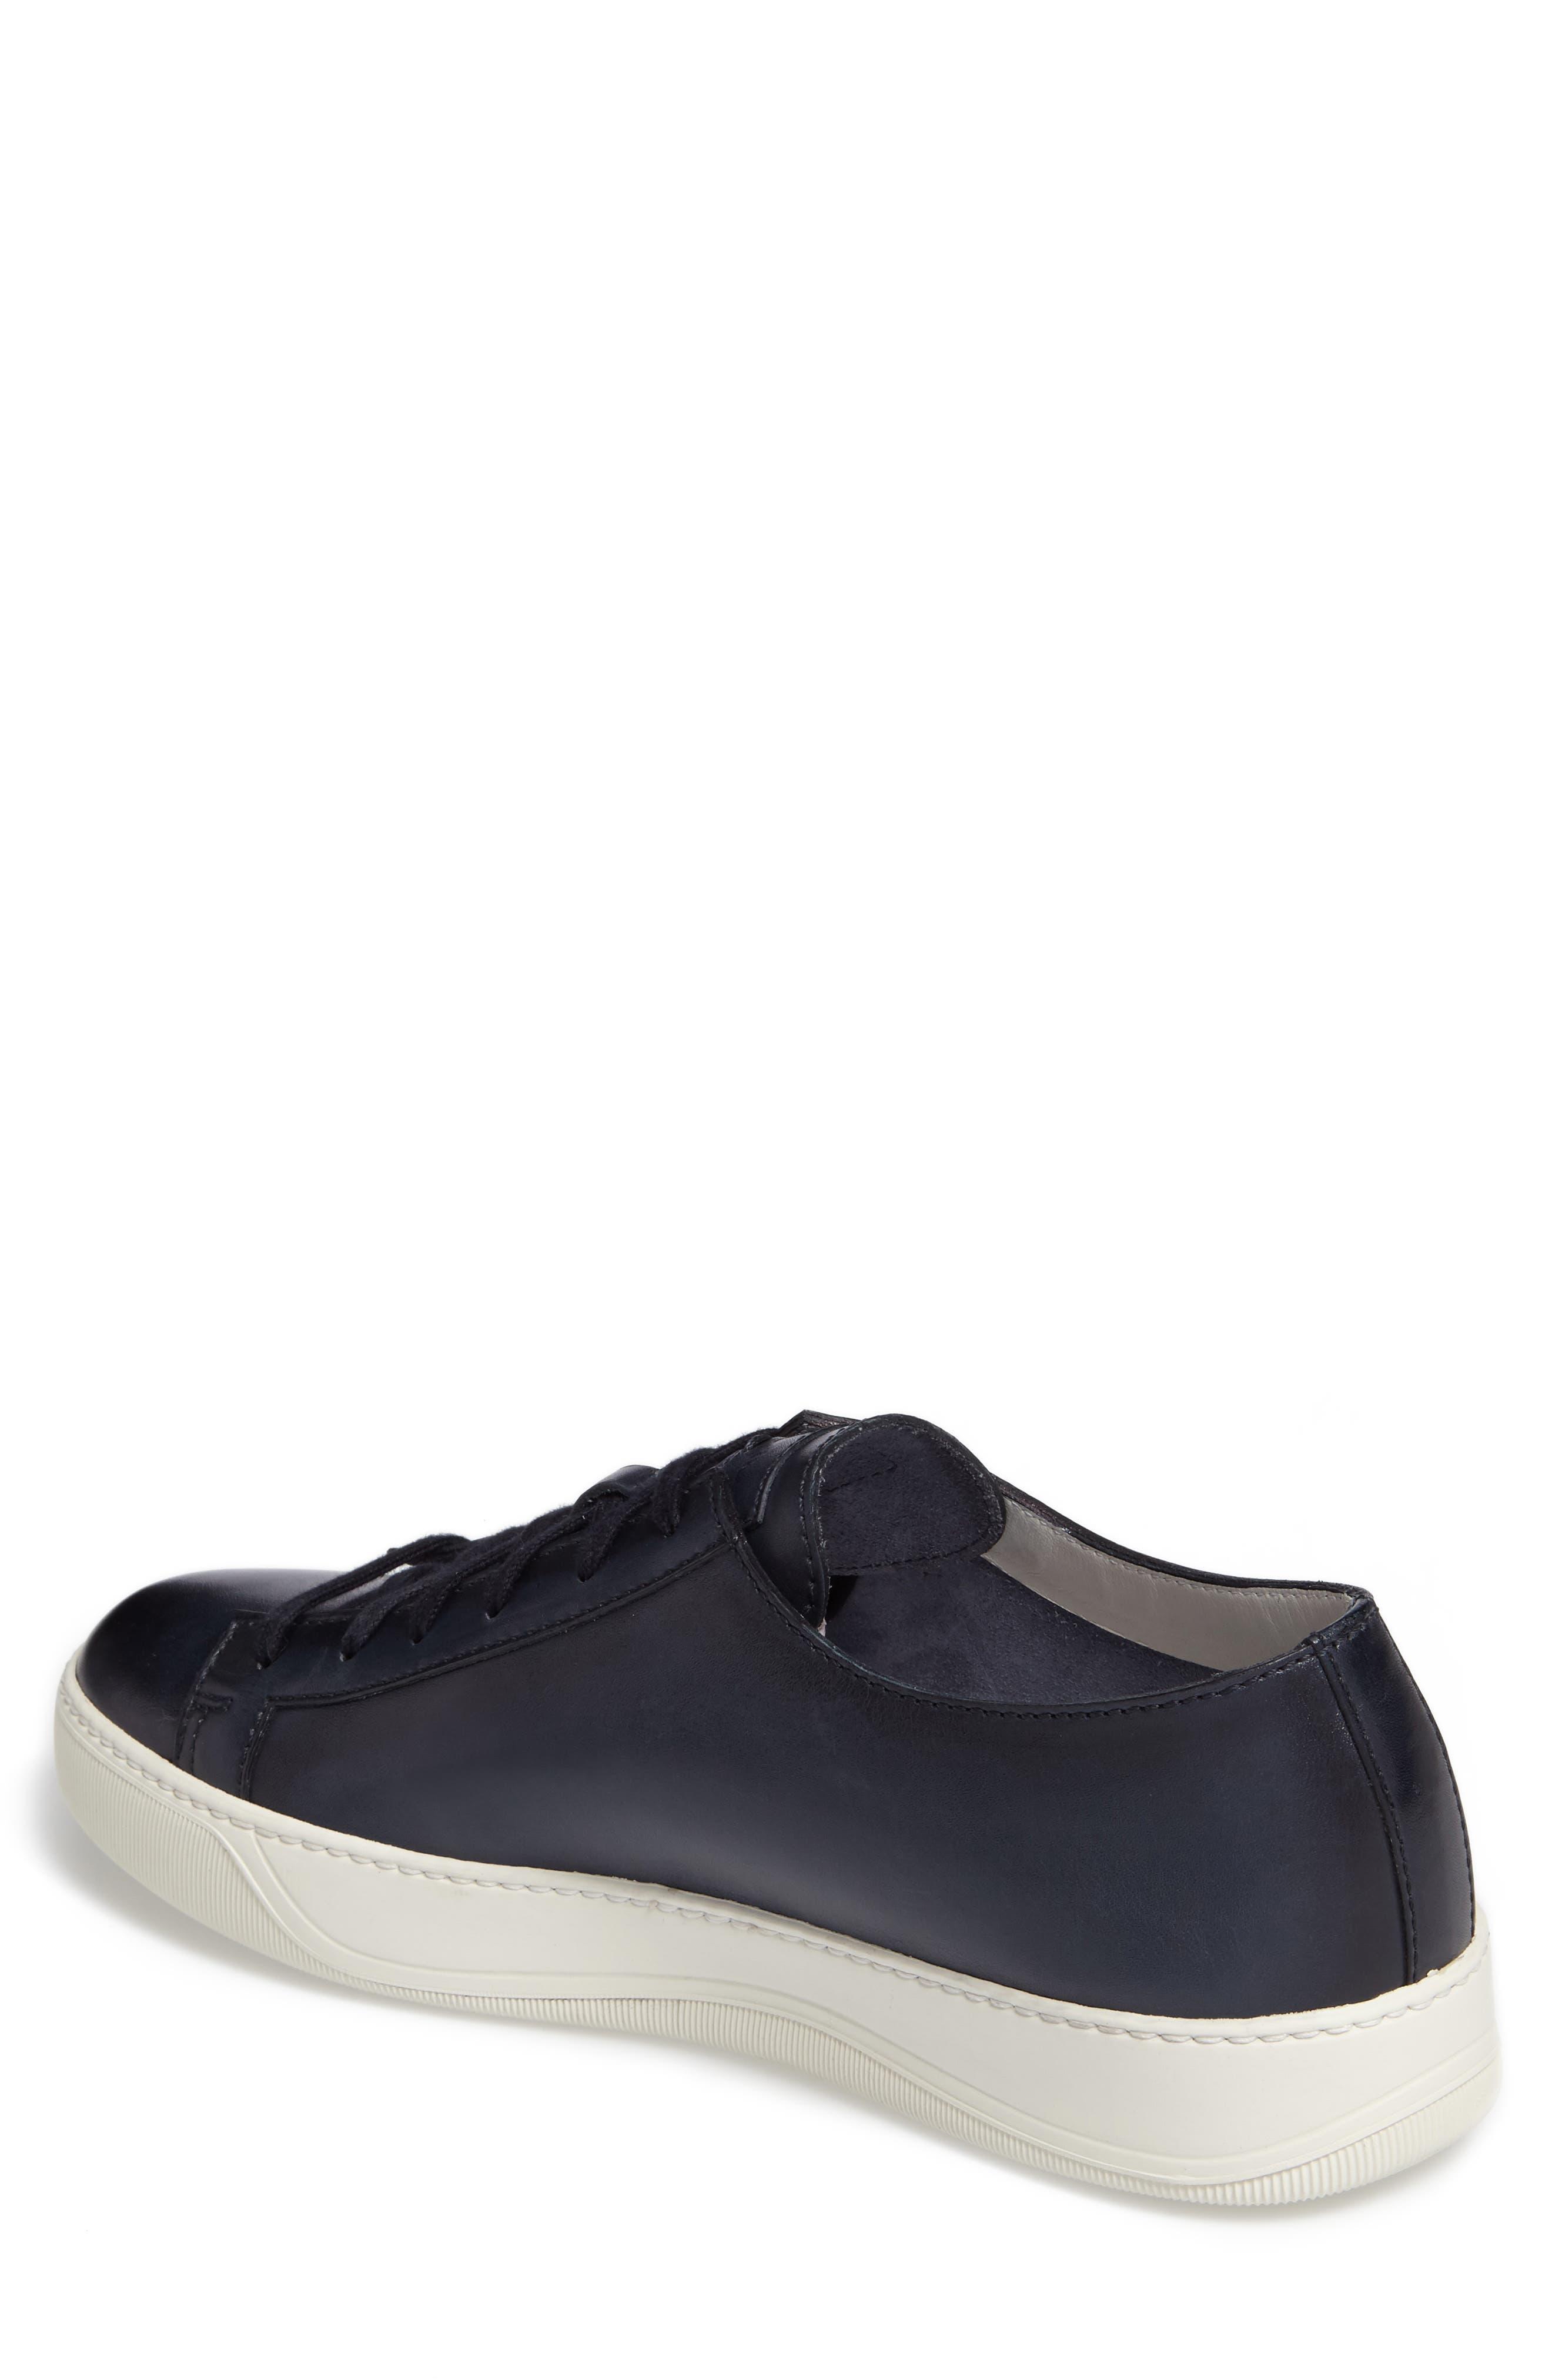 Cleanic Sneaker,                             Alternate thumbnail 9, color,